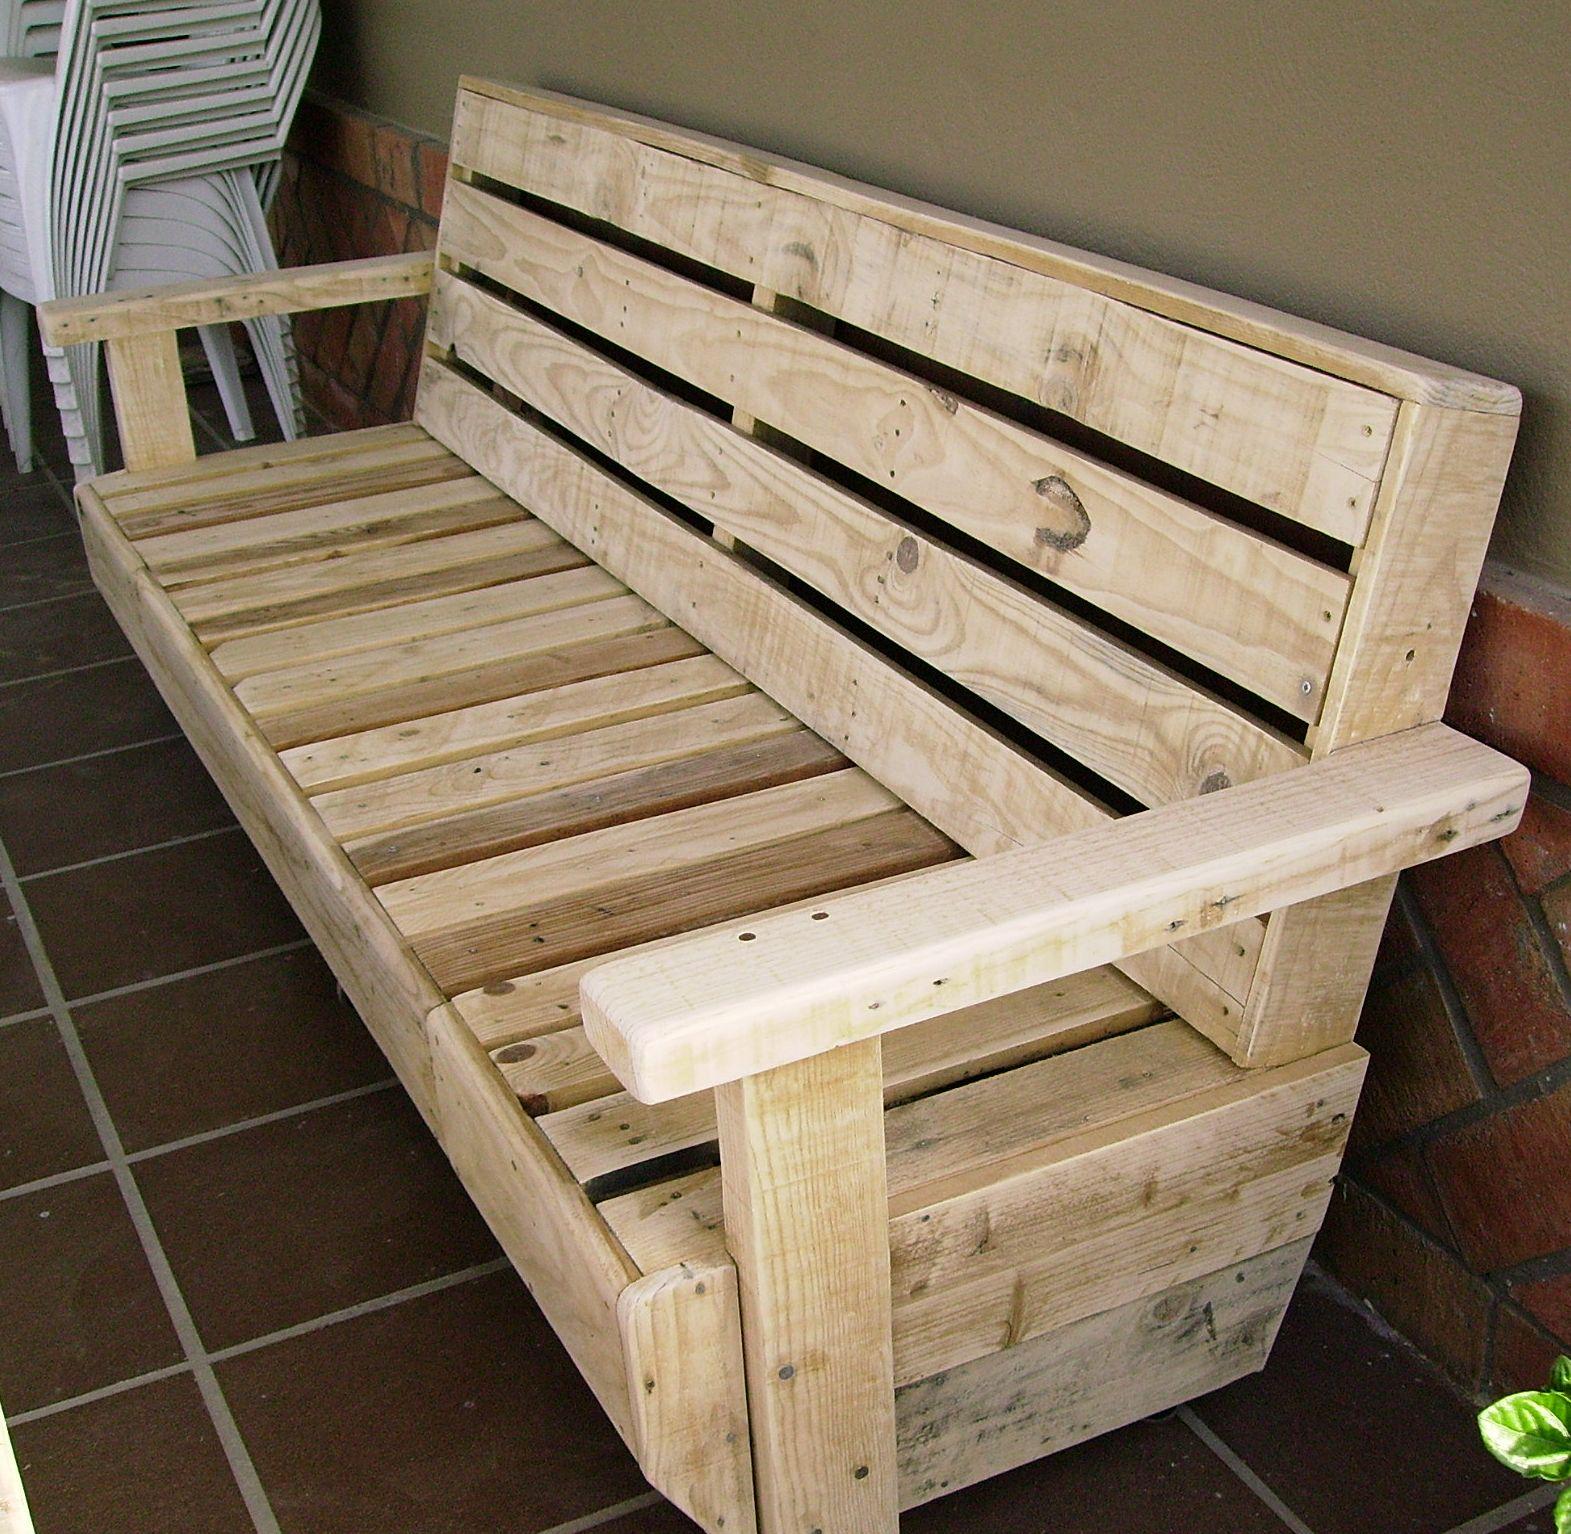 Artesanias labea muebles de exterior 100 reciclados for Sillones rusticos de madera